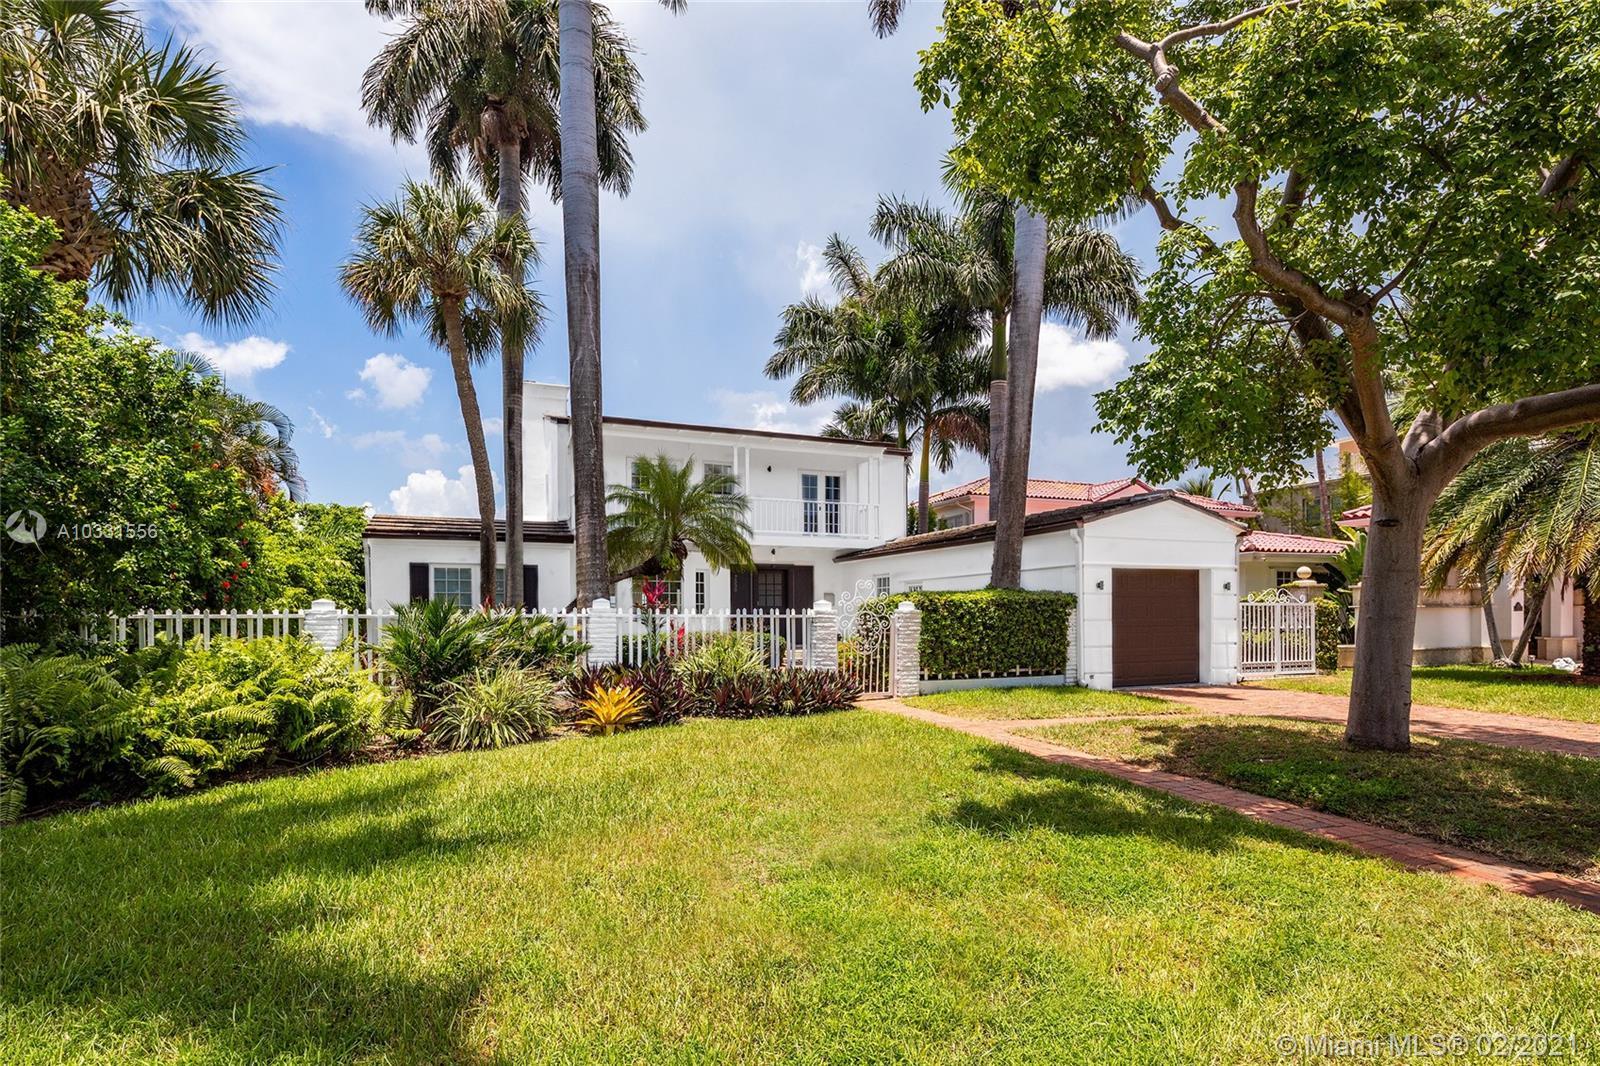 7530  Miami View Dr  For Sale A10331556, FL